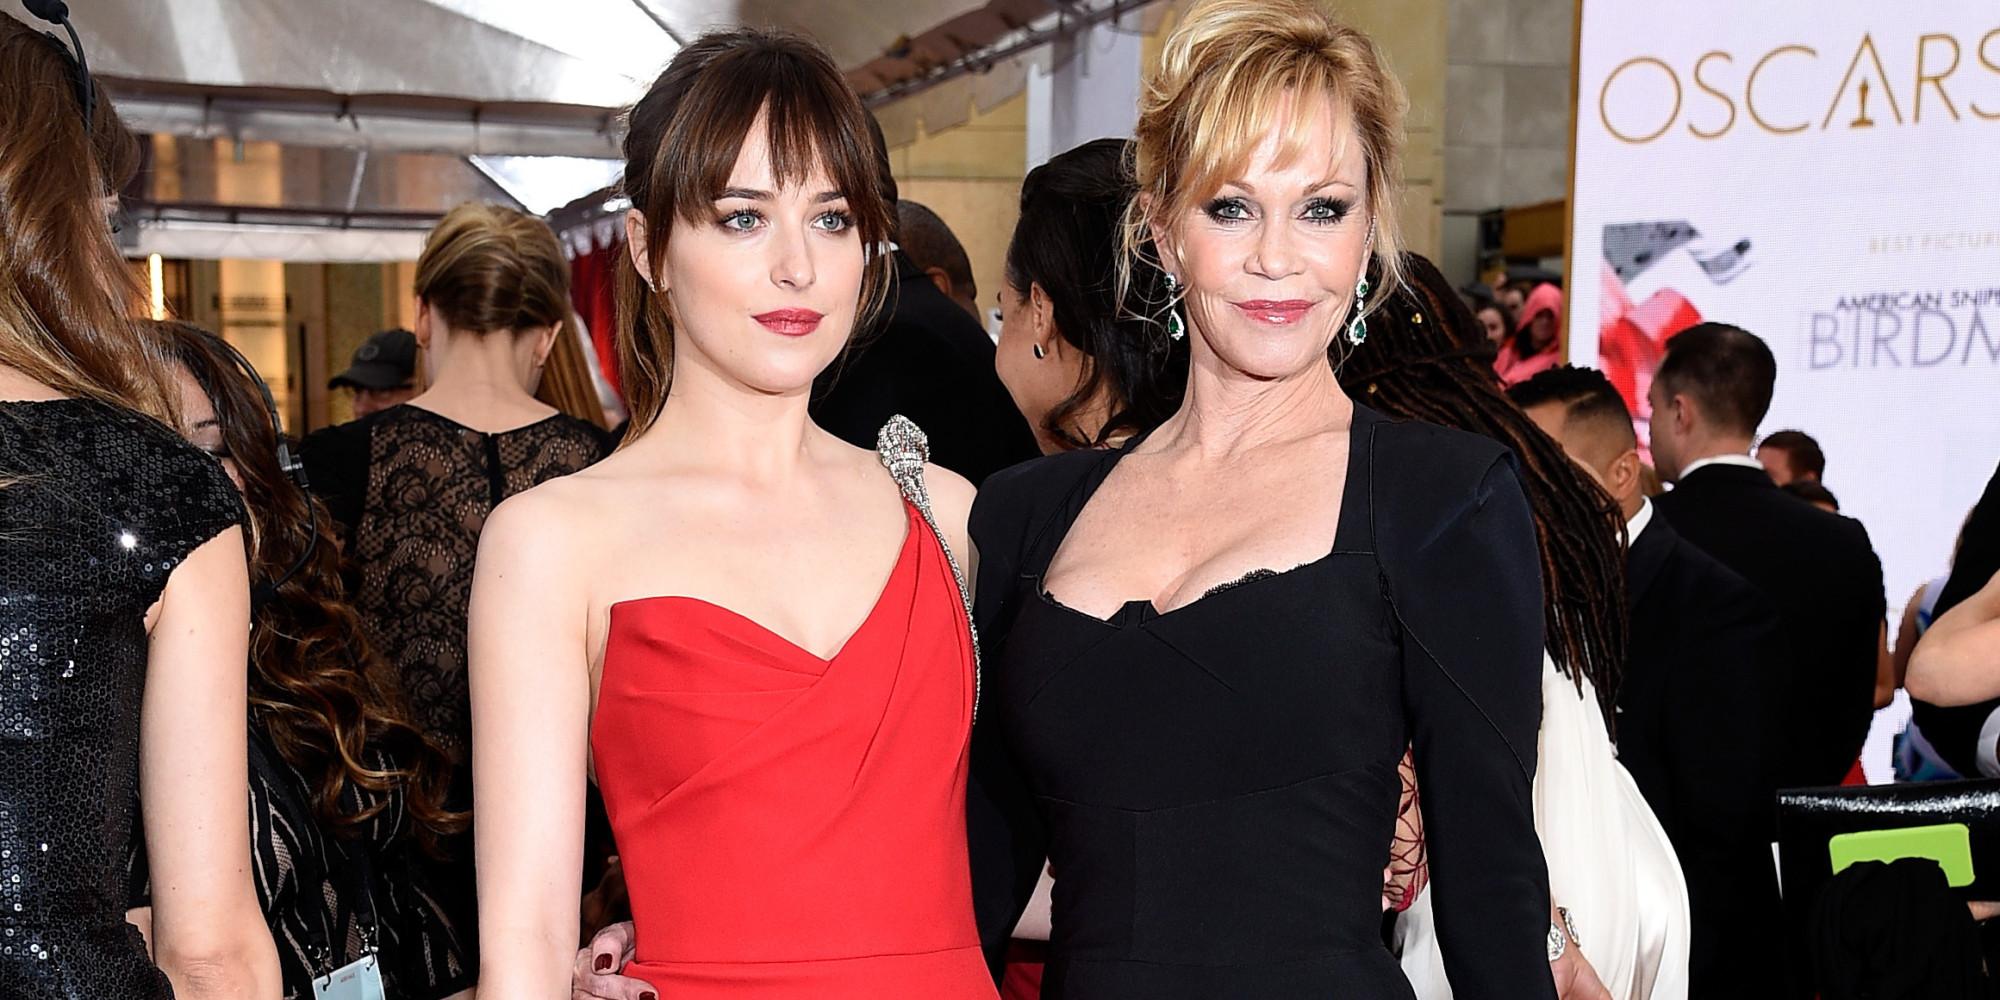 Oscars 2015 Red Carpet...